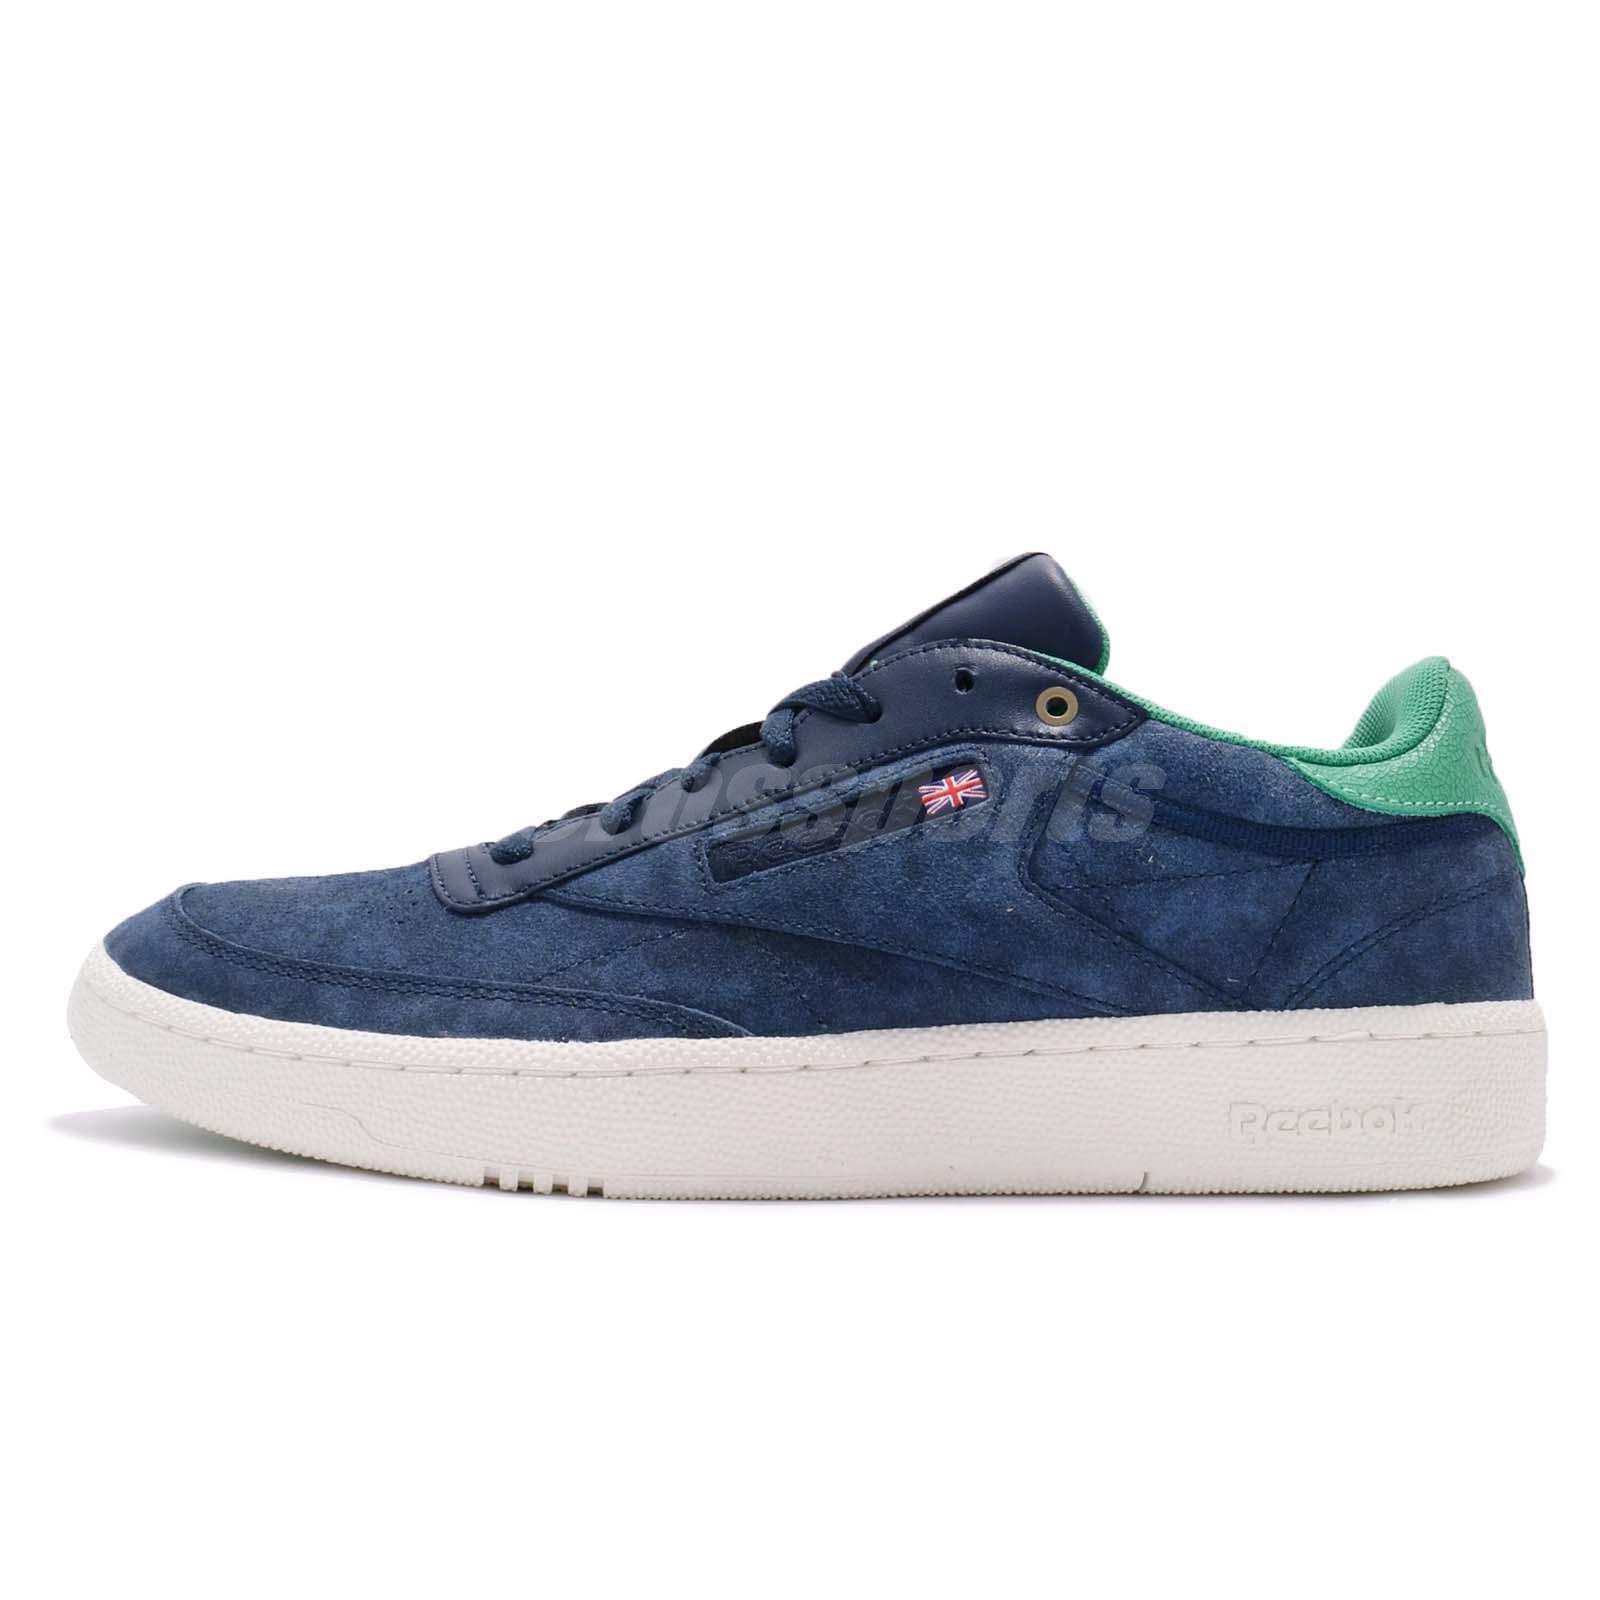 5dbd98c8a1a0d Montana Cans x Reebok Club C 85 PRO MCCE Blue Note Ultramarine Men Shoes  CM9271